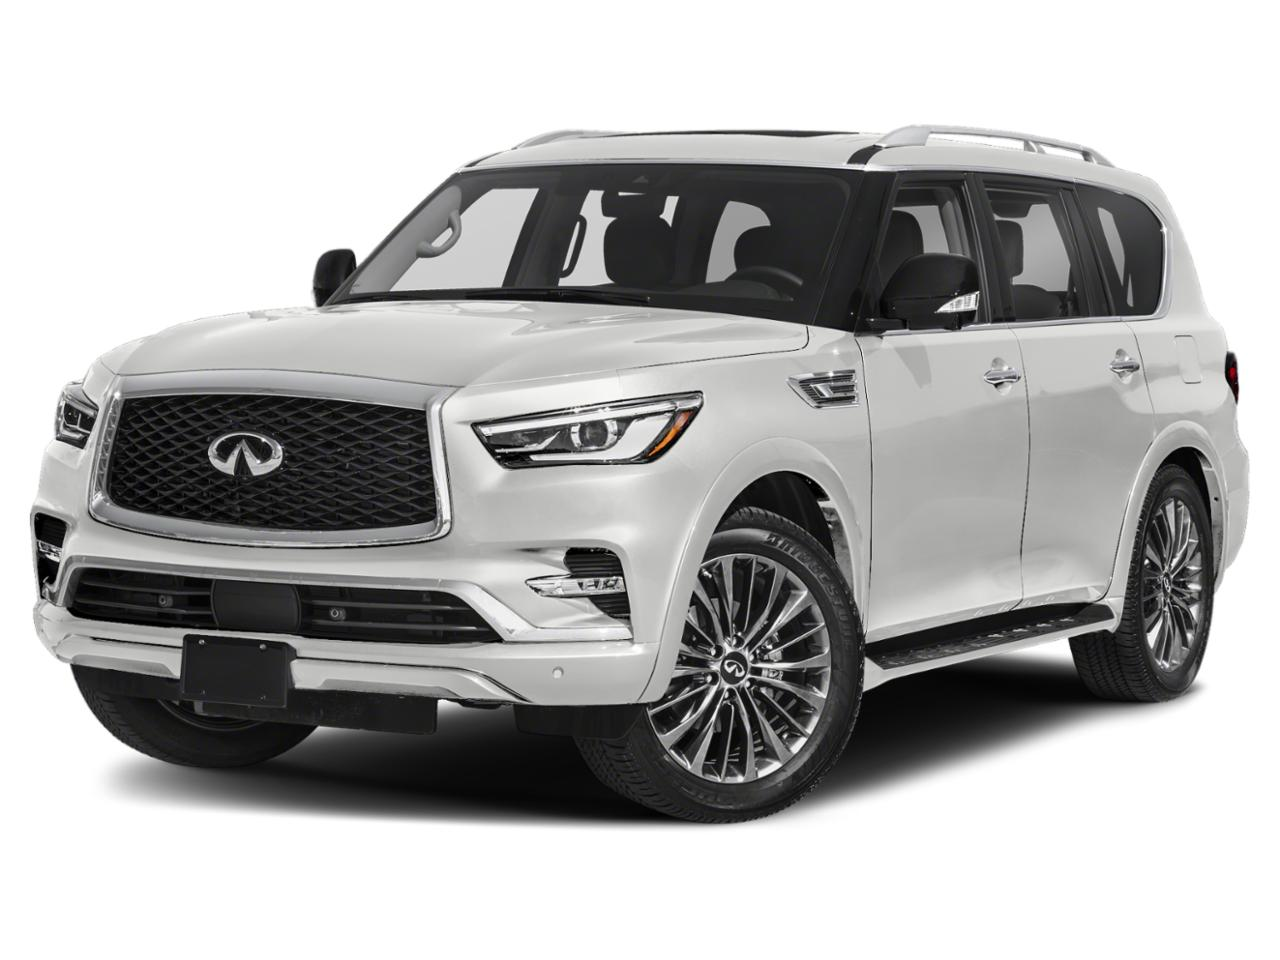 dallas 2021 new infiniti qx80 models for sale - serving